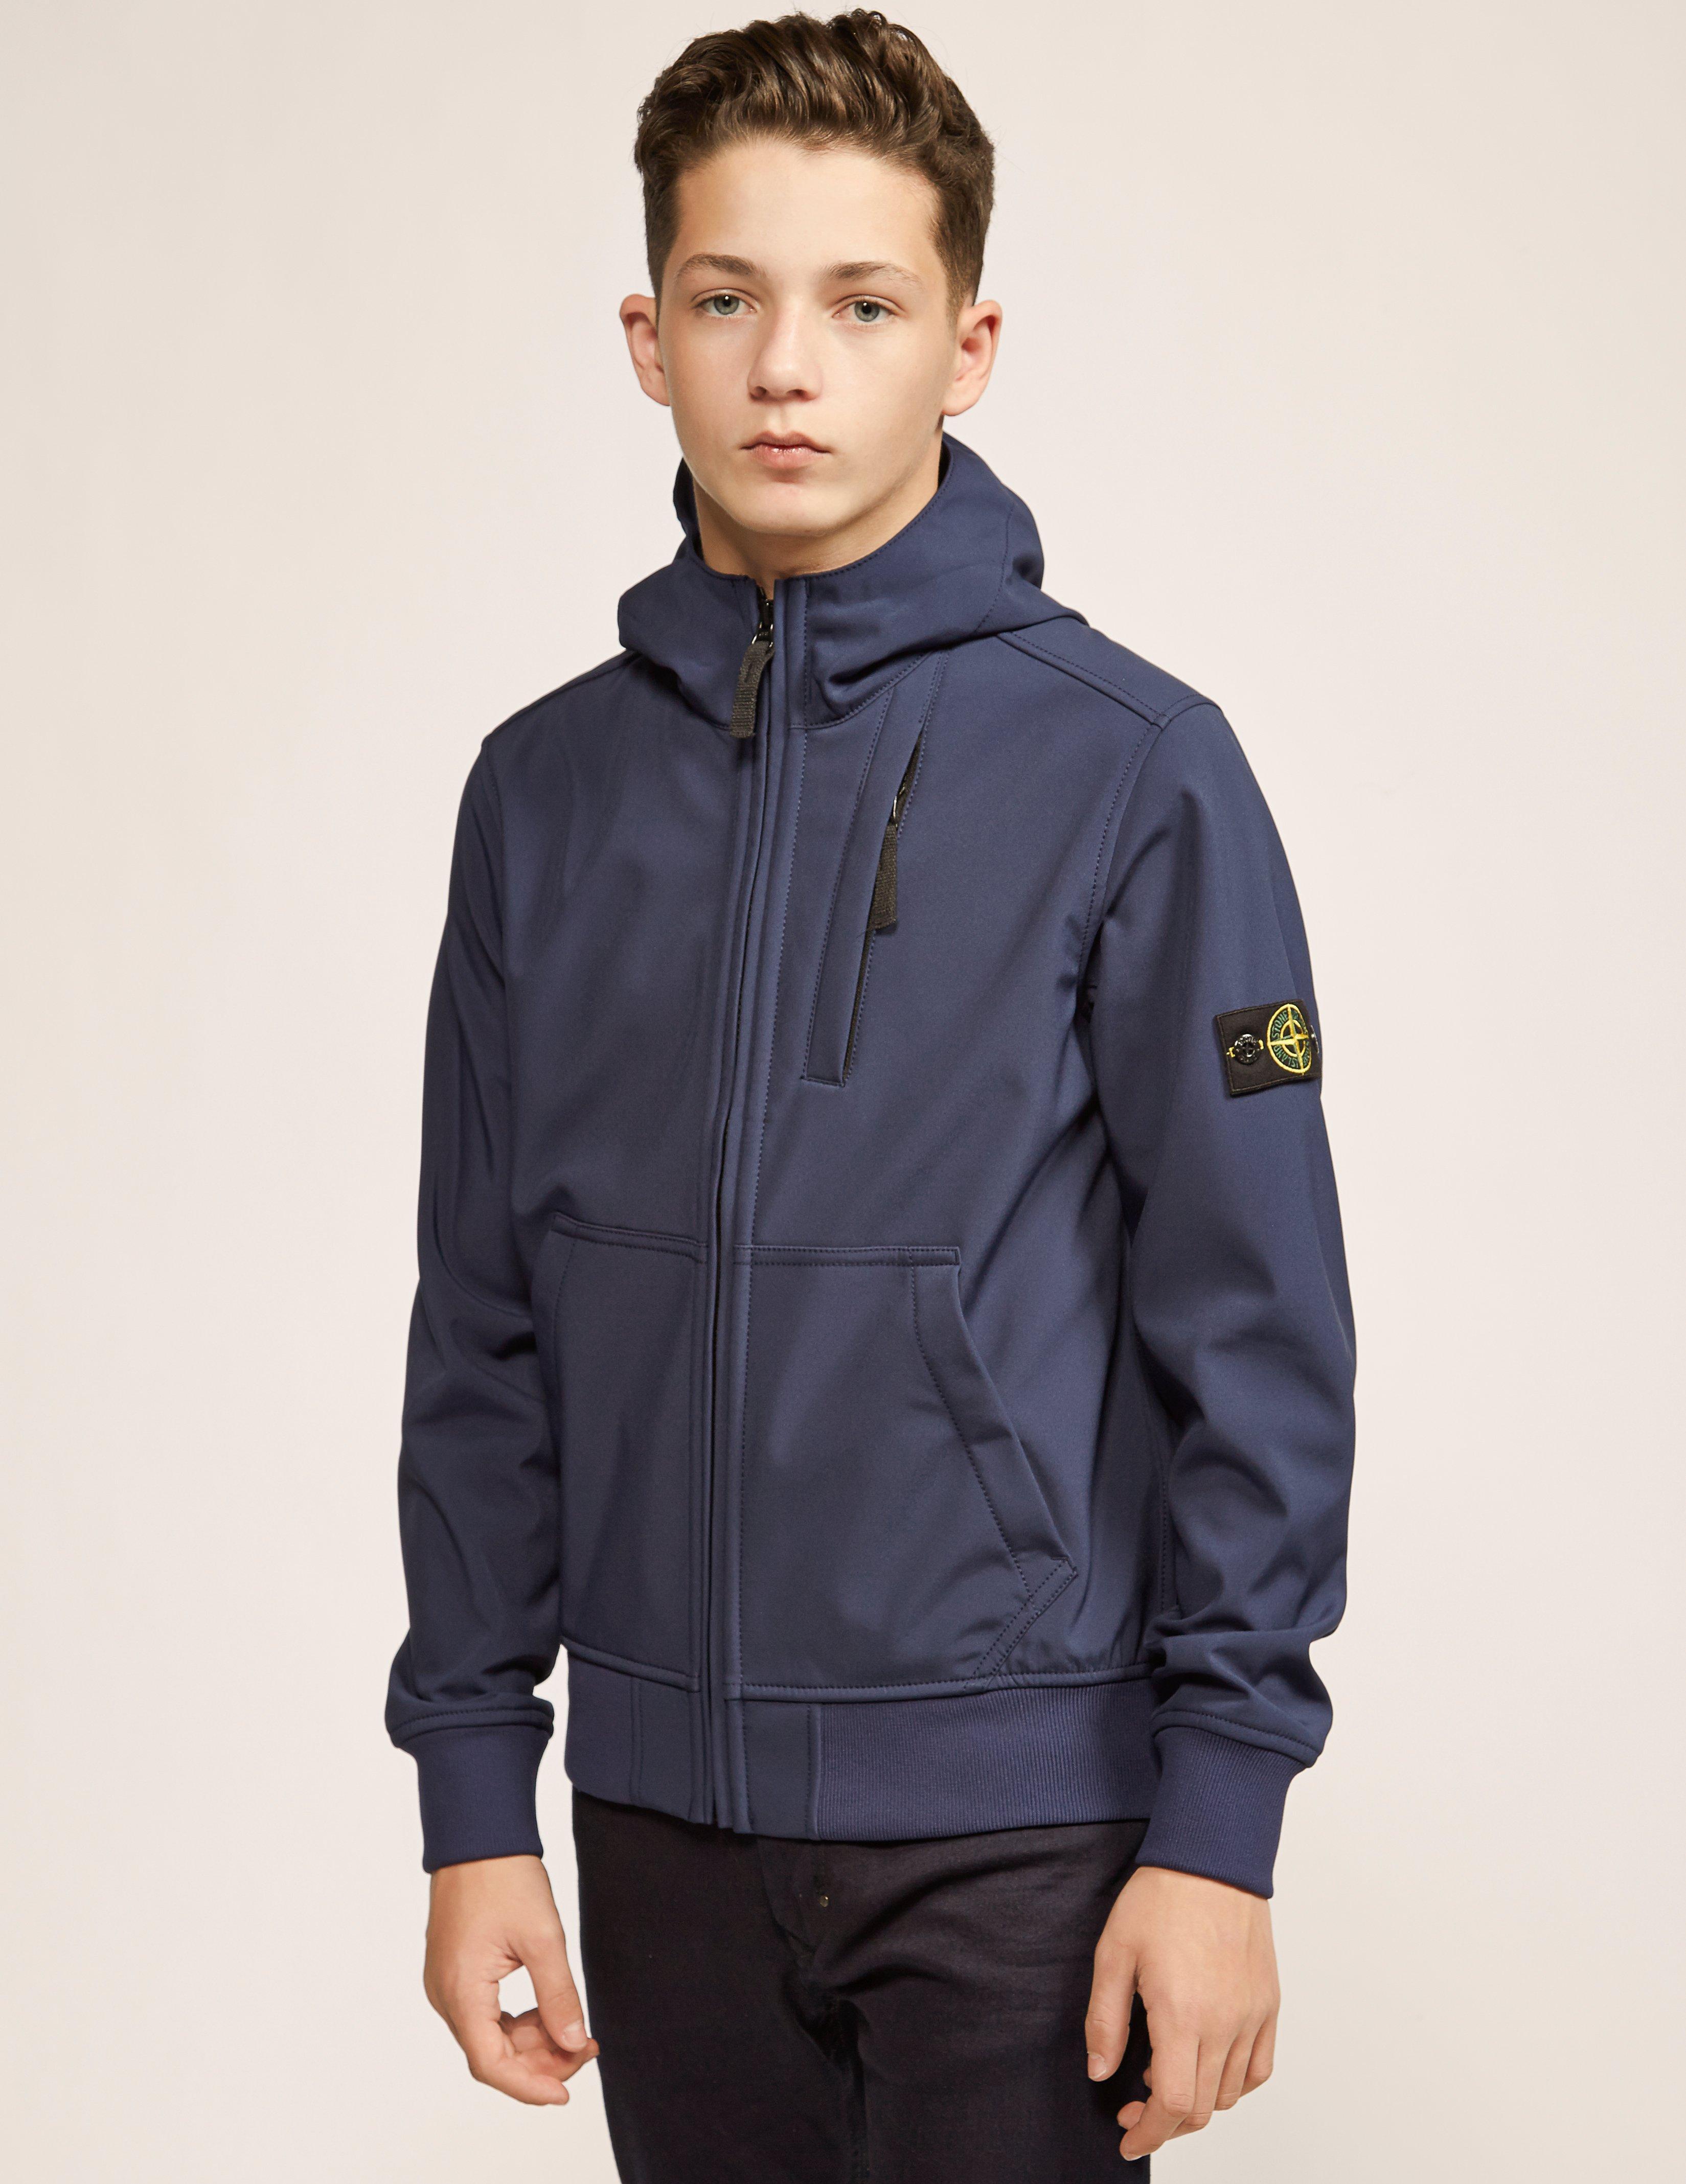 Cheap Junior Jackets - Jacket To